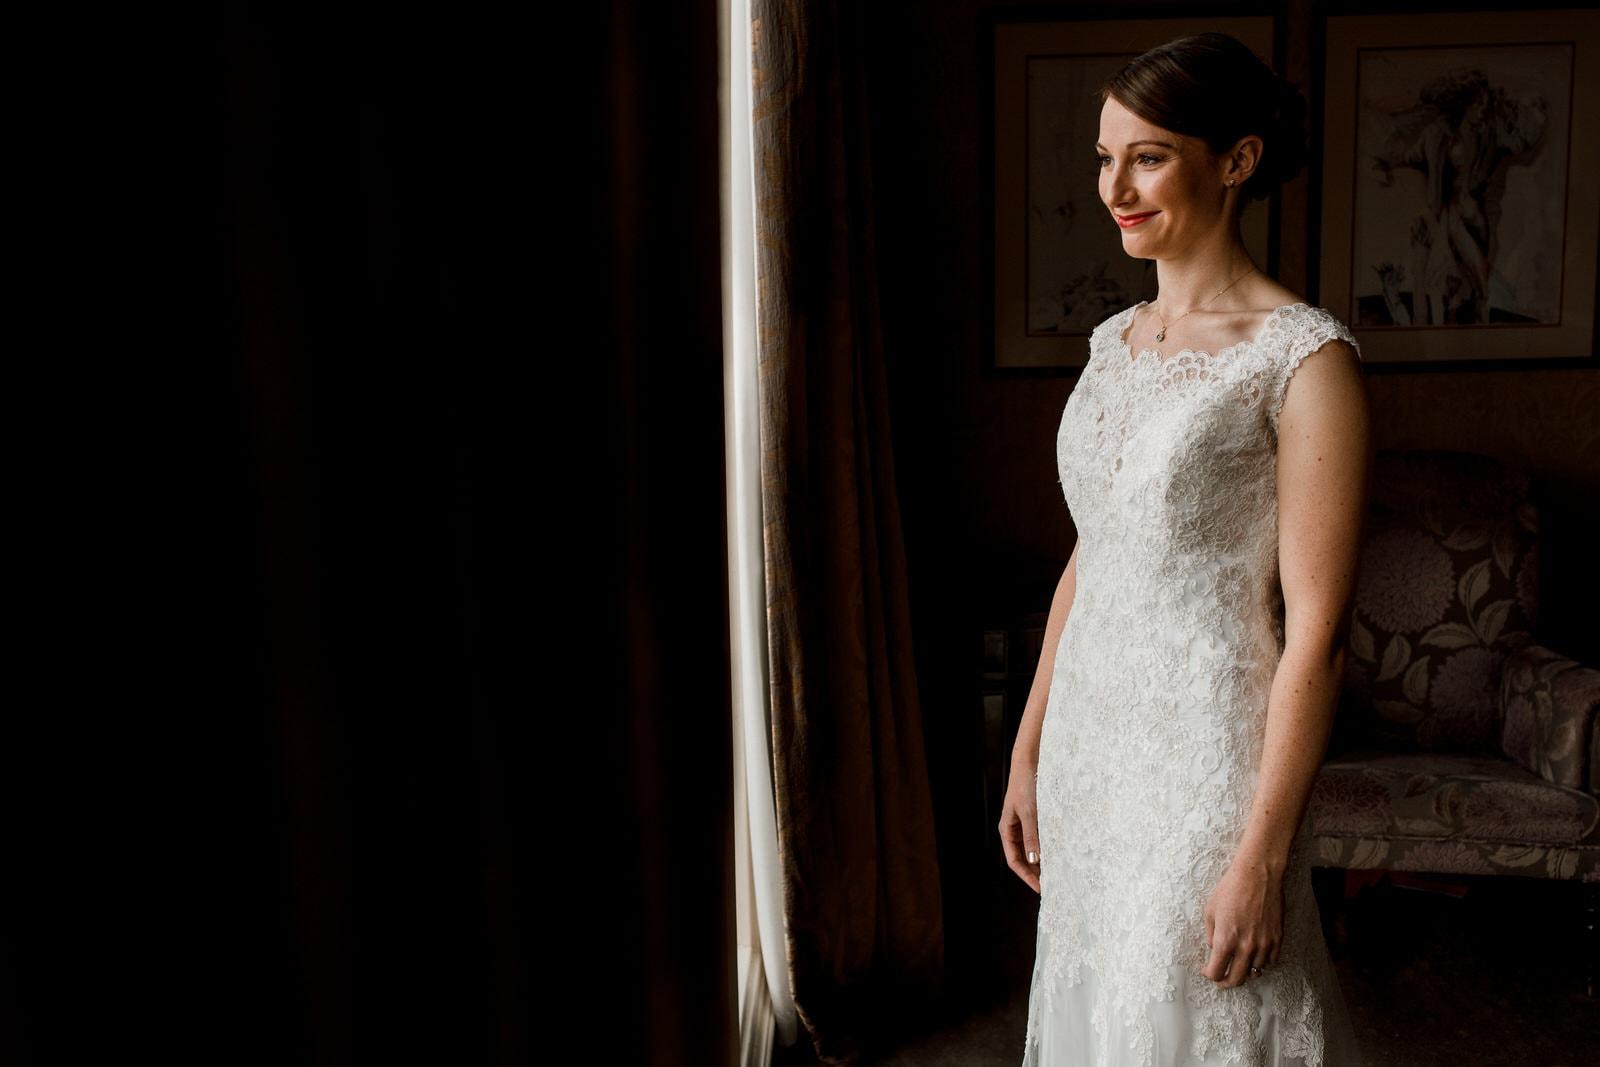 bridal portrait at petersham hotel richmond